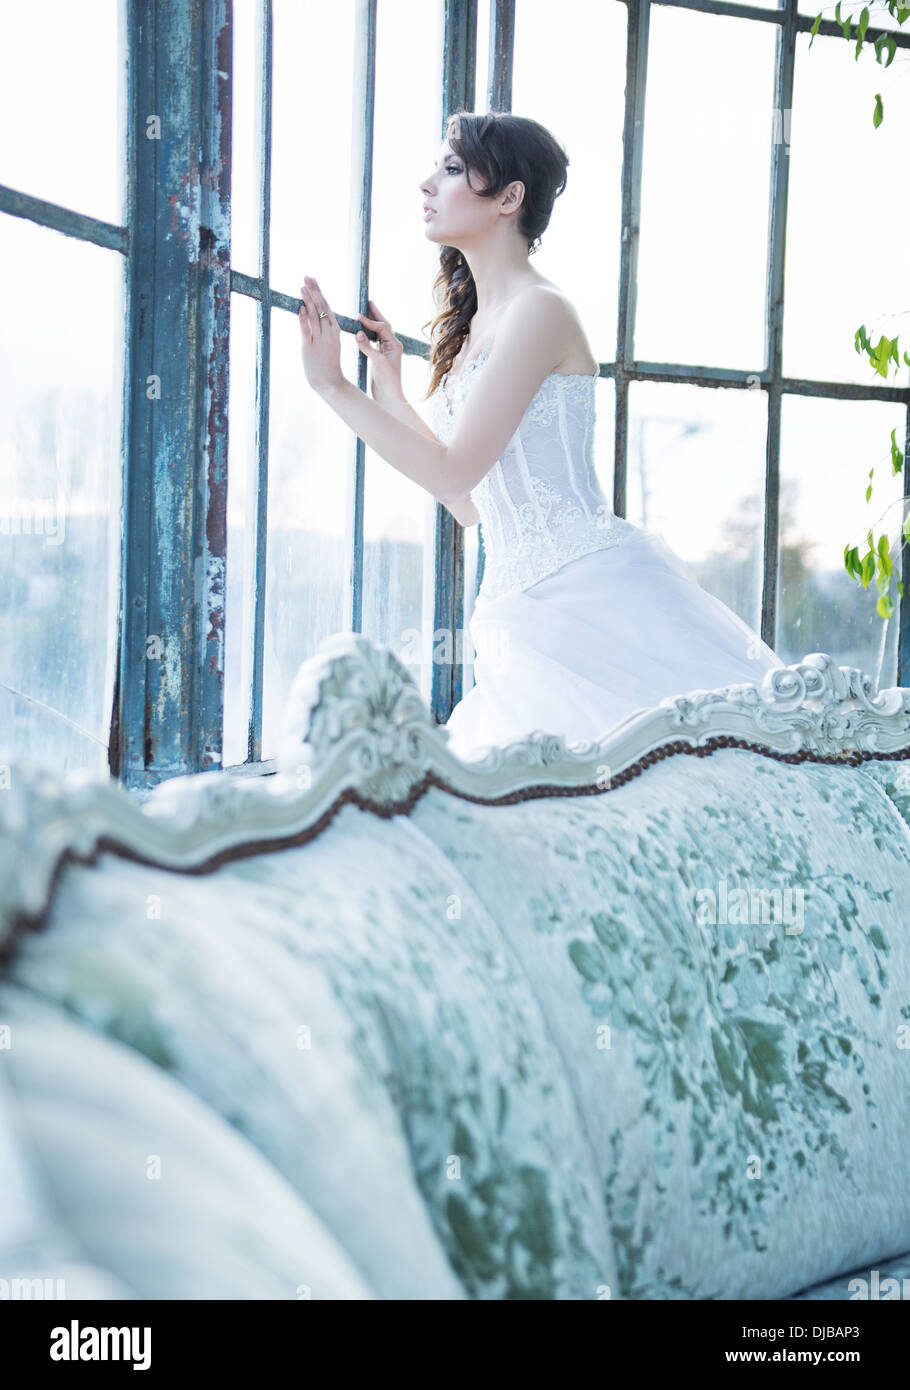 Missing bride looking for her beloved husband - Stock Image